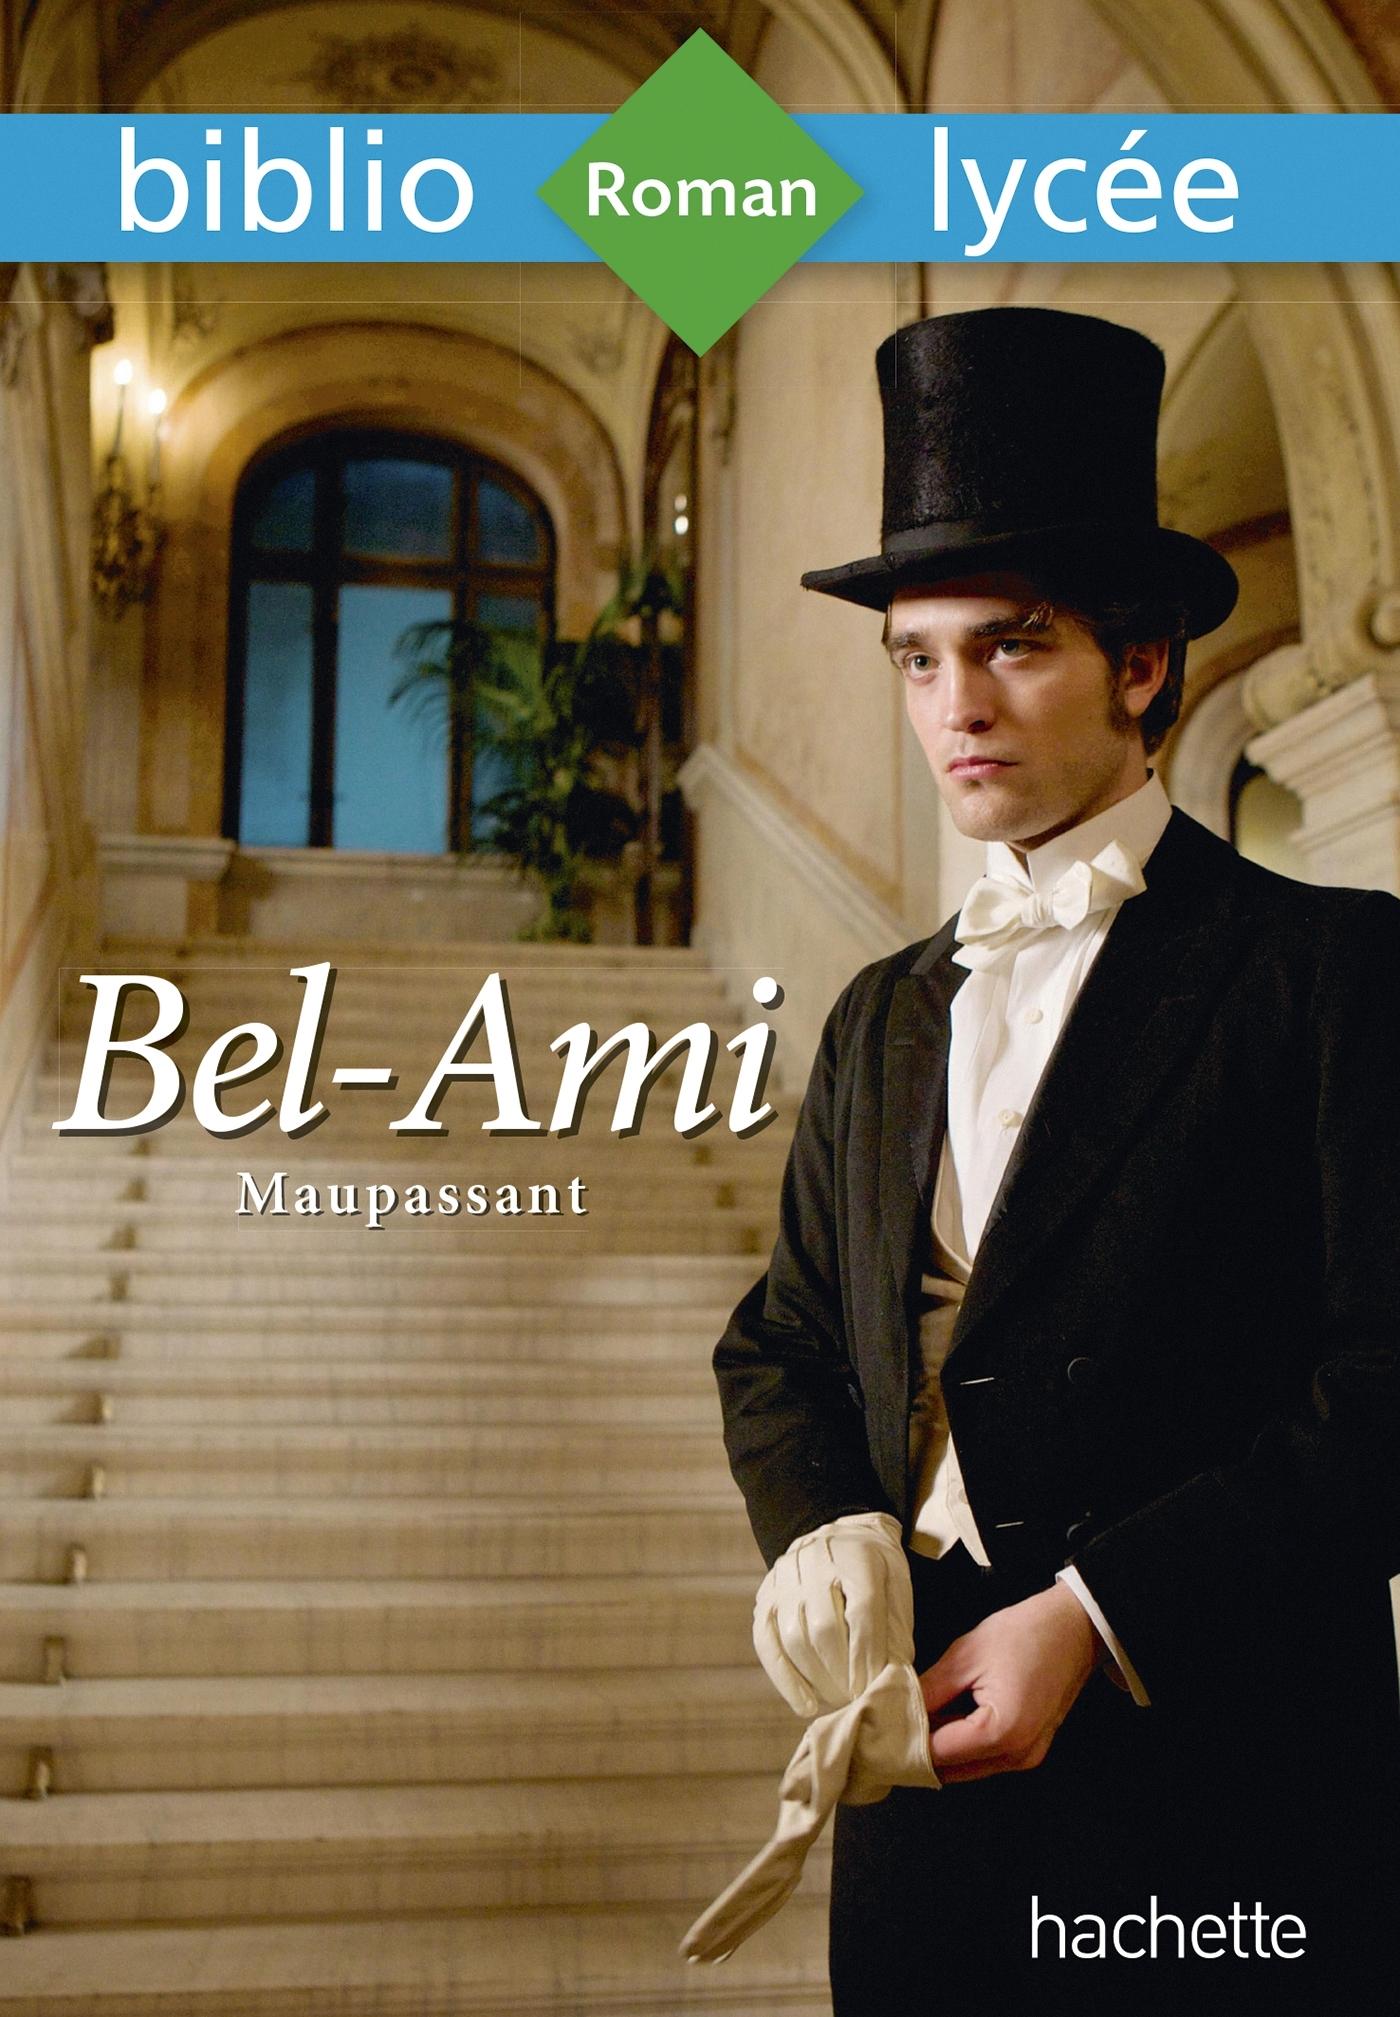 BIBLIOLYCEE - BEL-AMI, MAUPASSANT